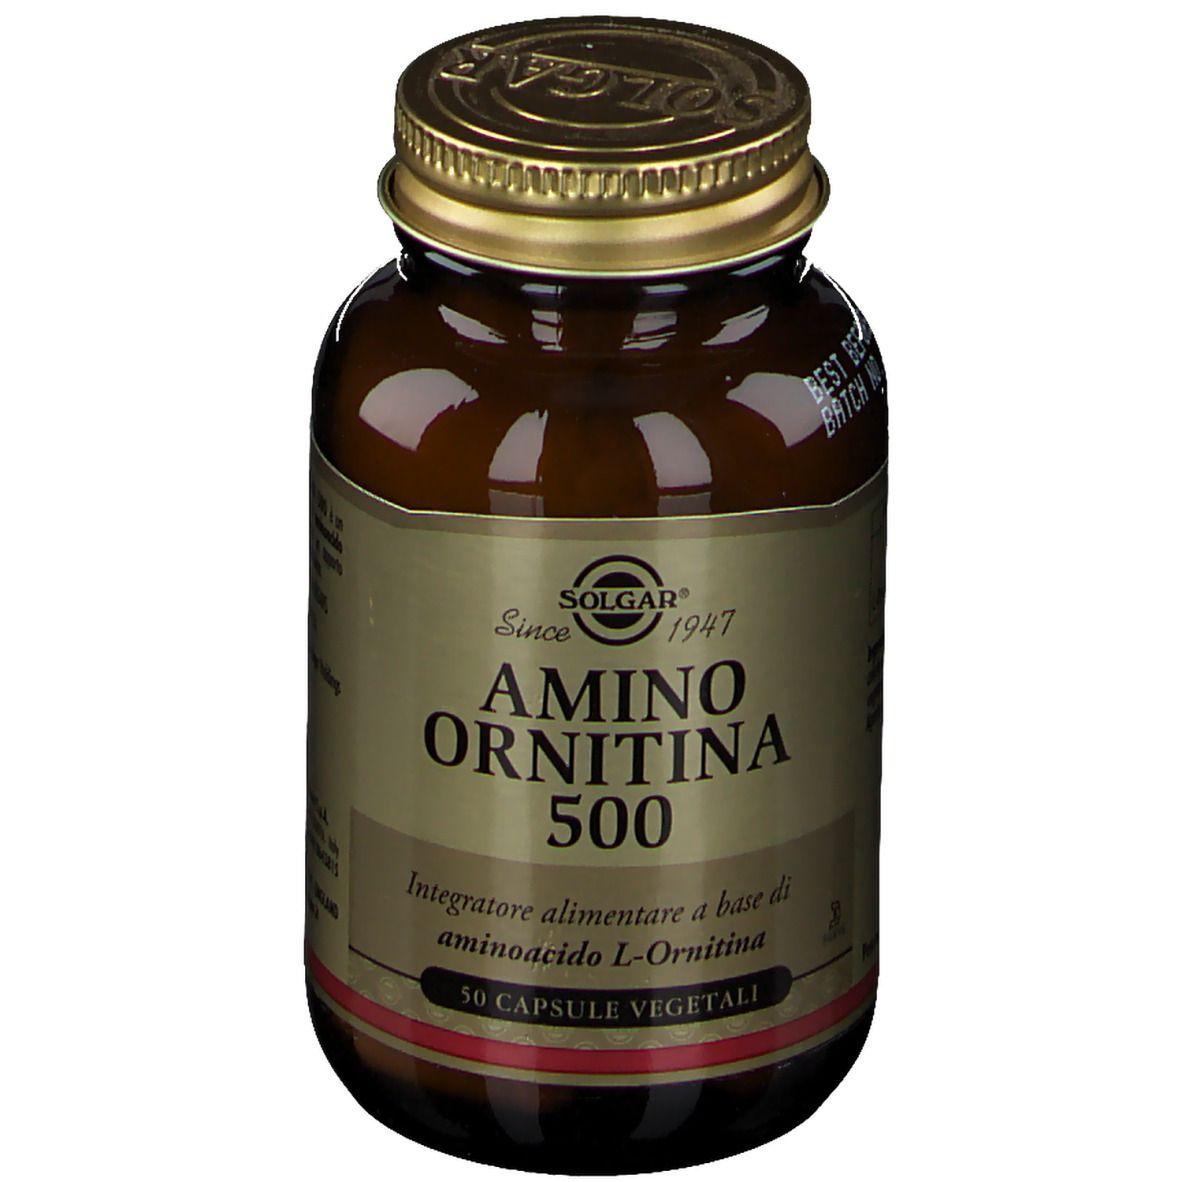 SOLGAR® Amino Ornitina 500